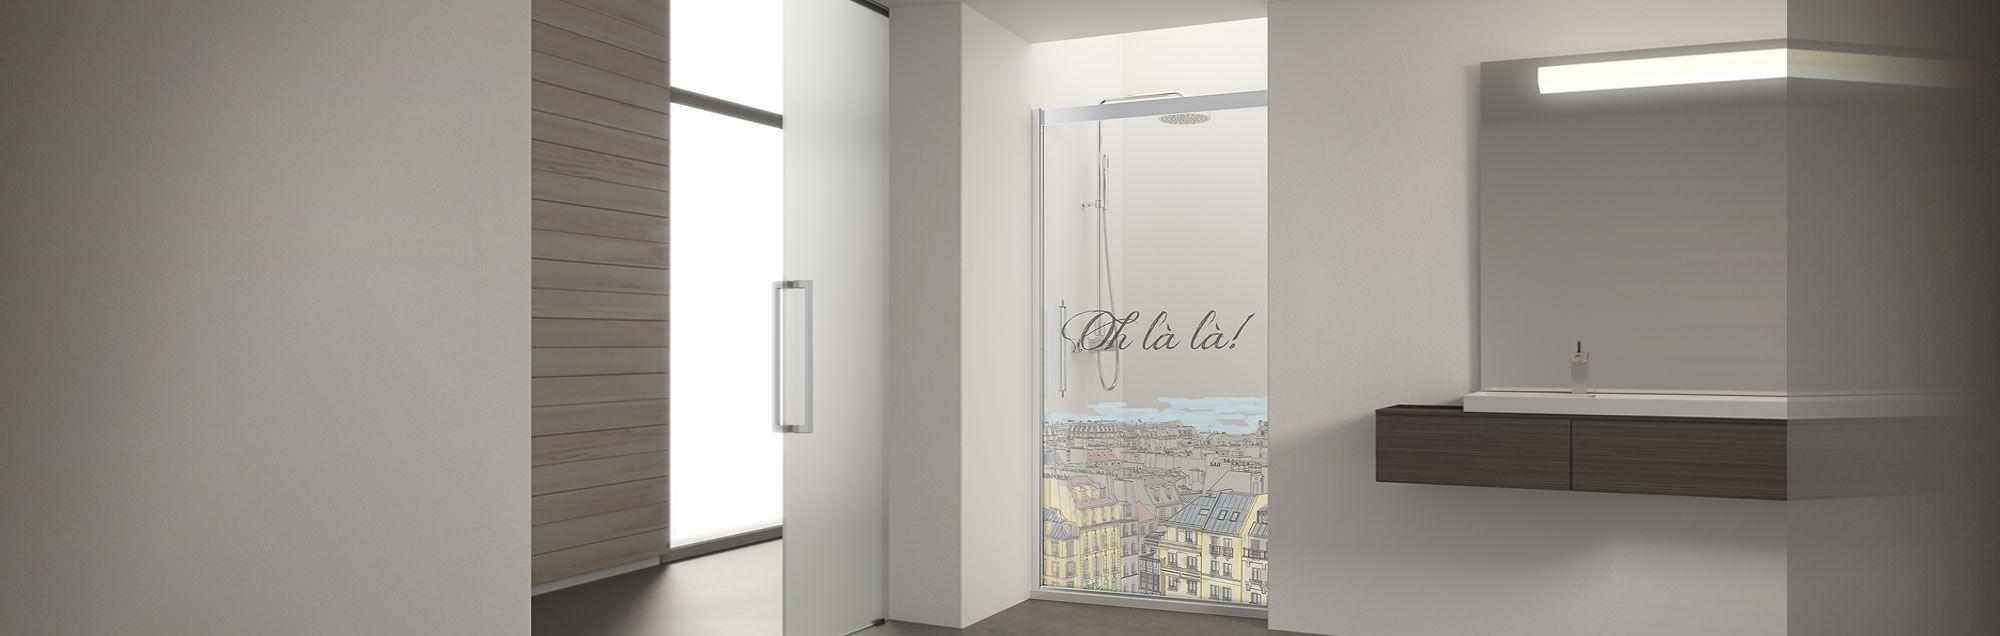 Box doccia Speciali su misura PROFILTEK